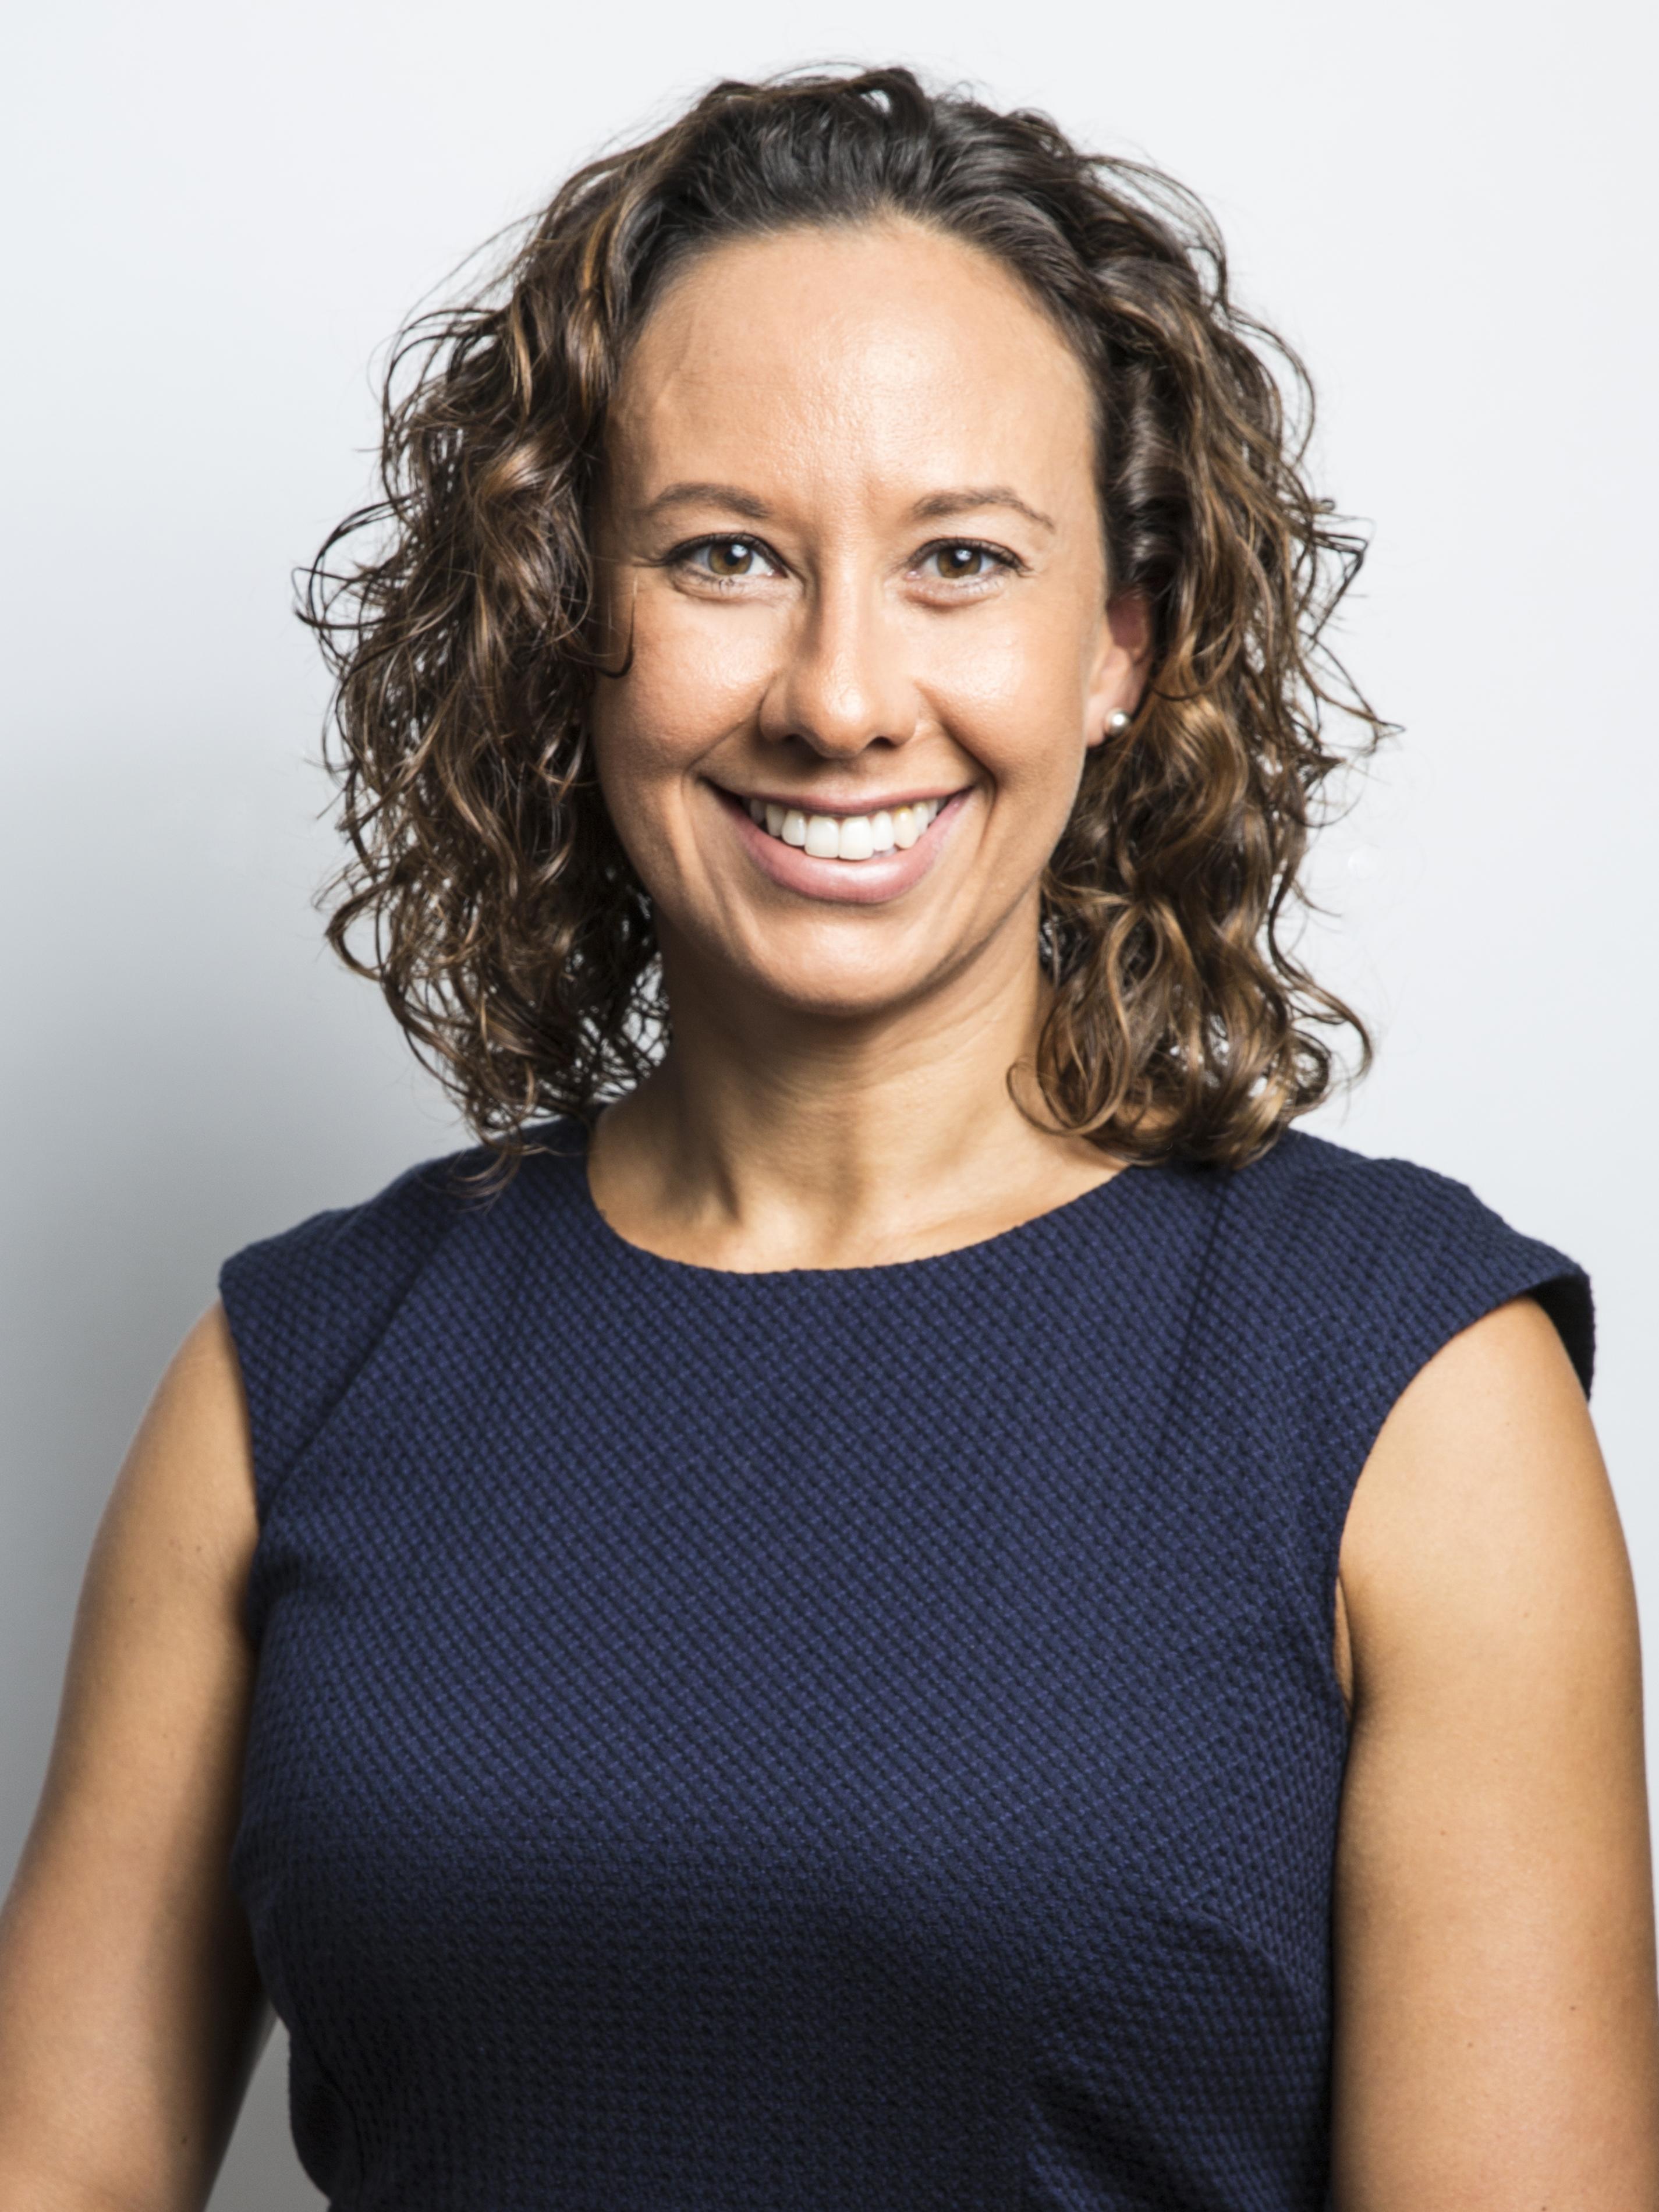 Melanie Battaglia